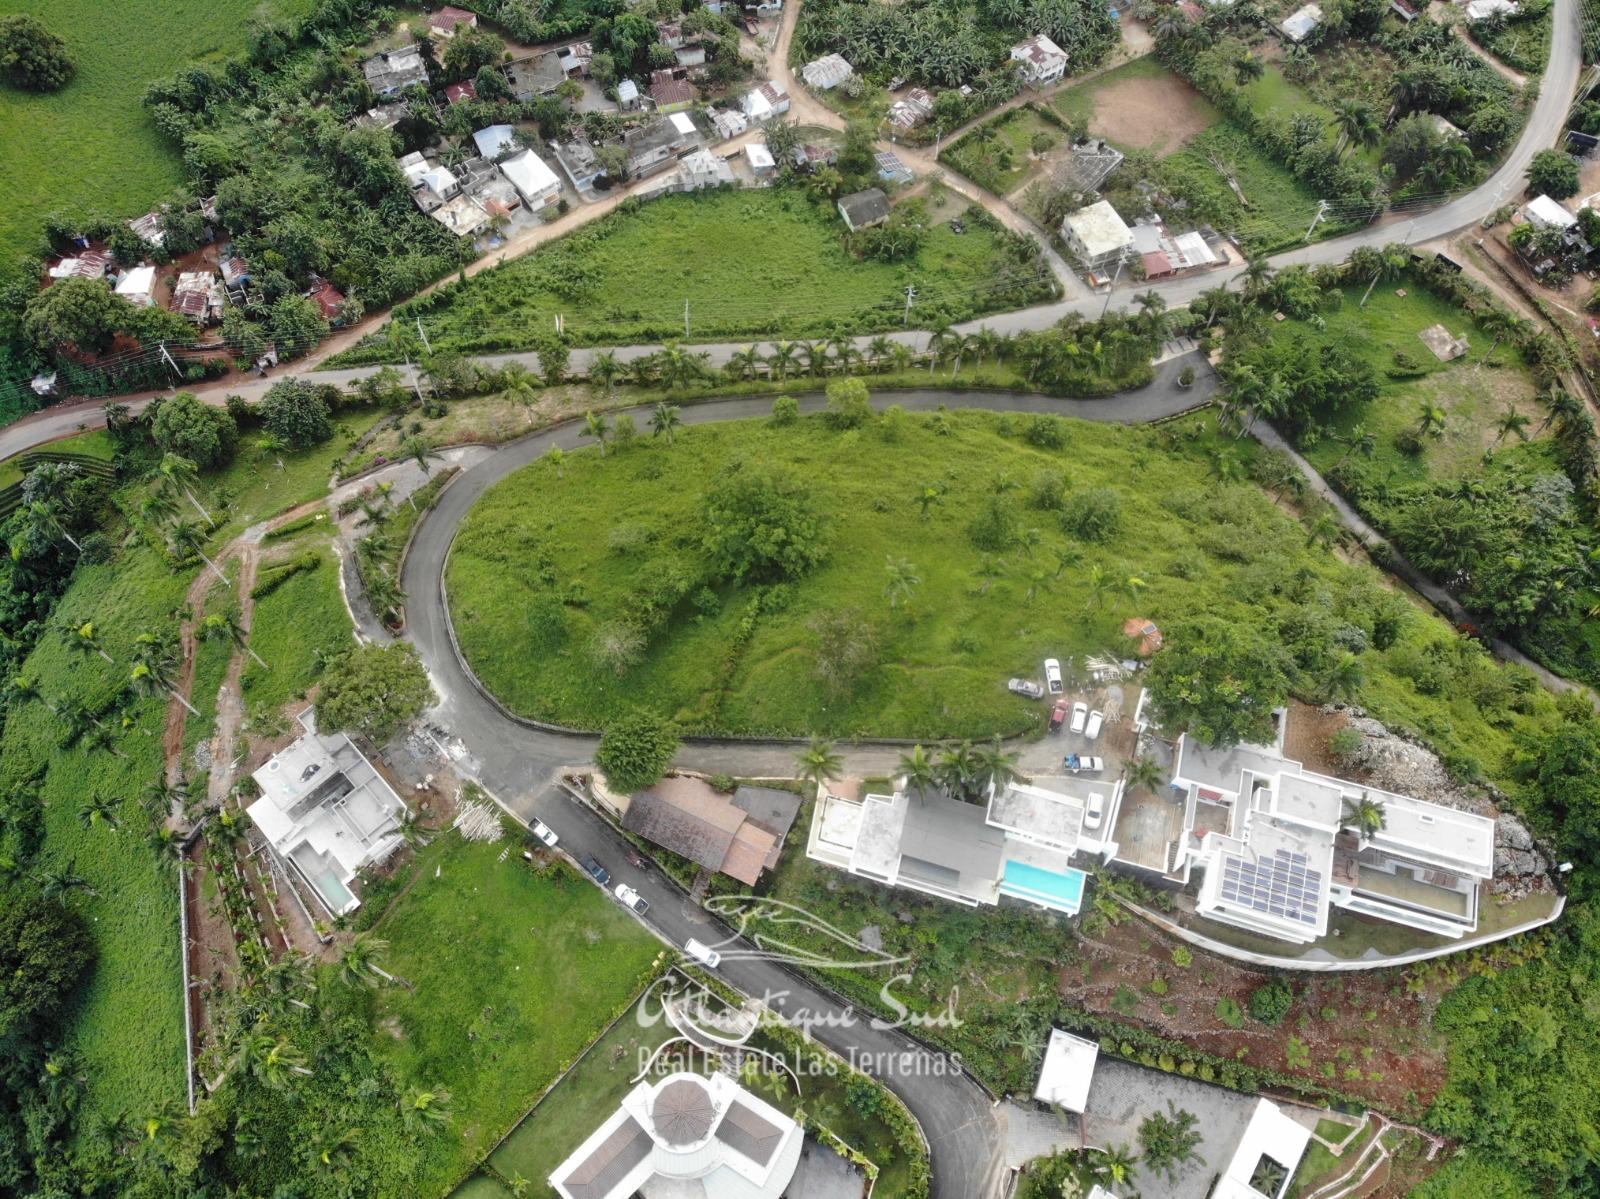 Hillside Lots for sale in Las Terrenas32.jpeg